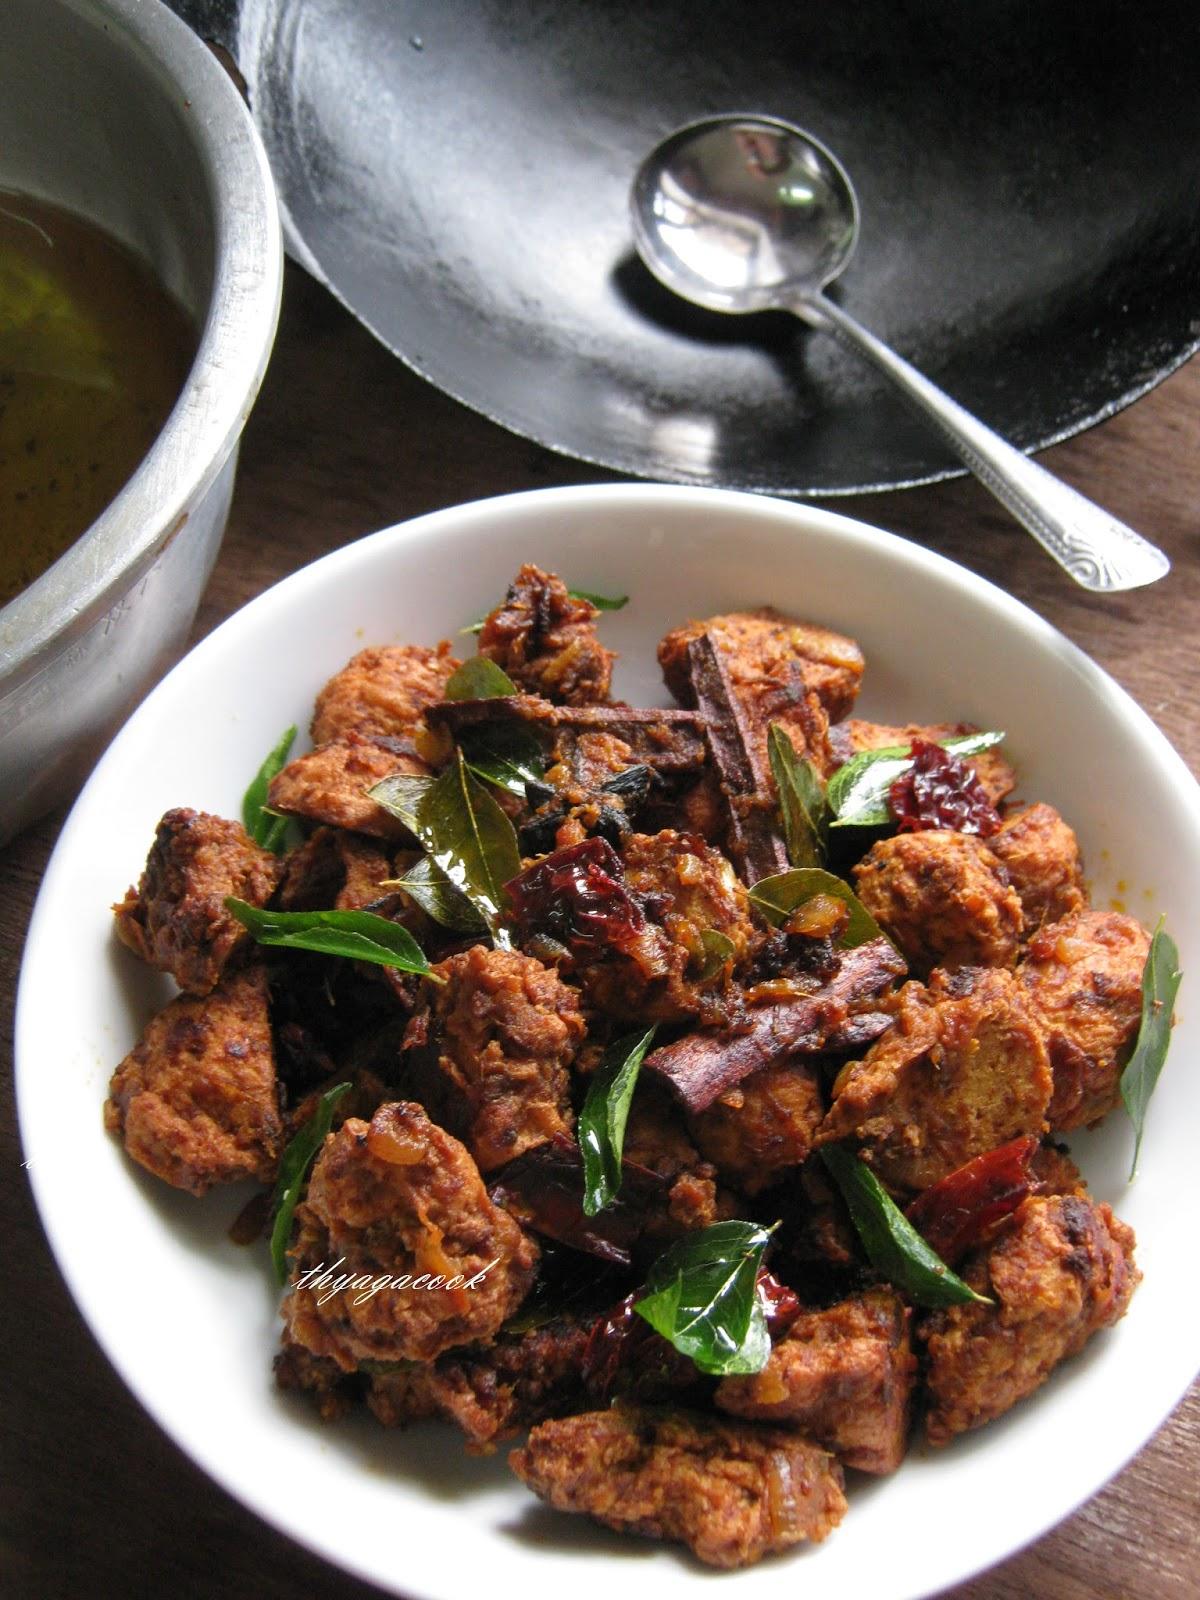 Kari leafs malaysian flavours vegetarian chicken varuval friday september 13 2013 forumfinder Images